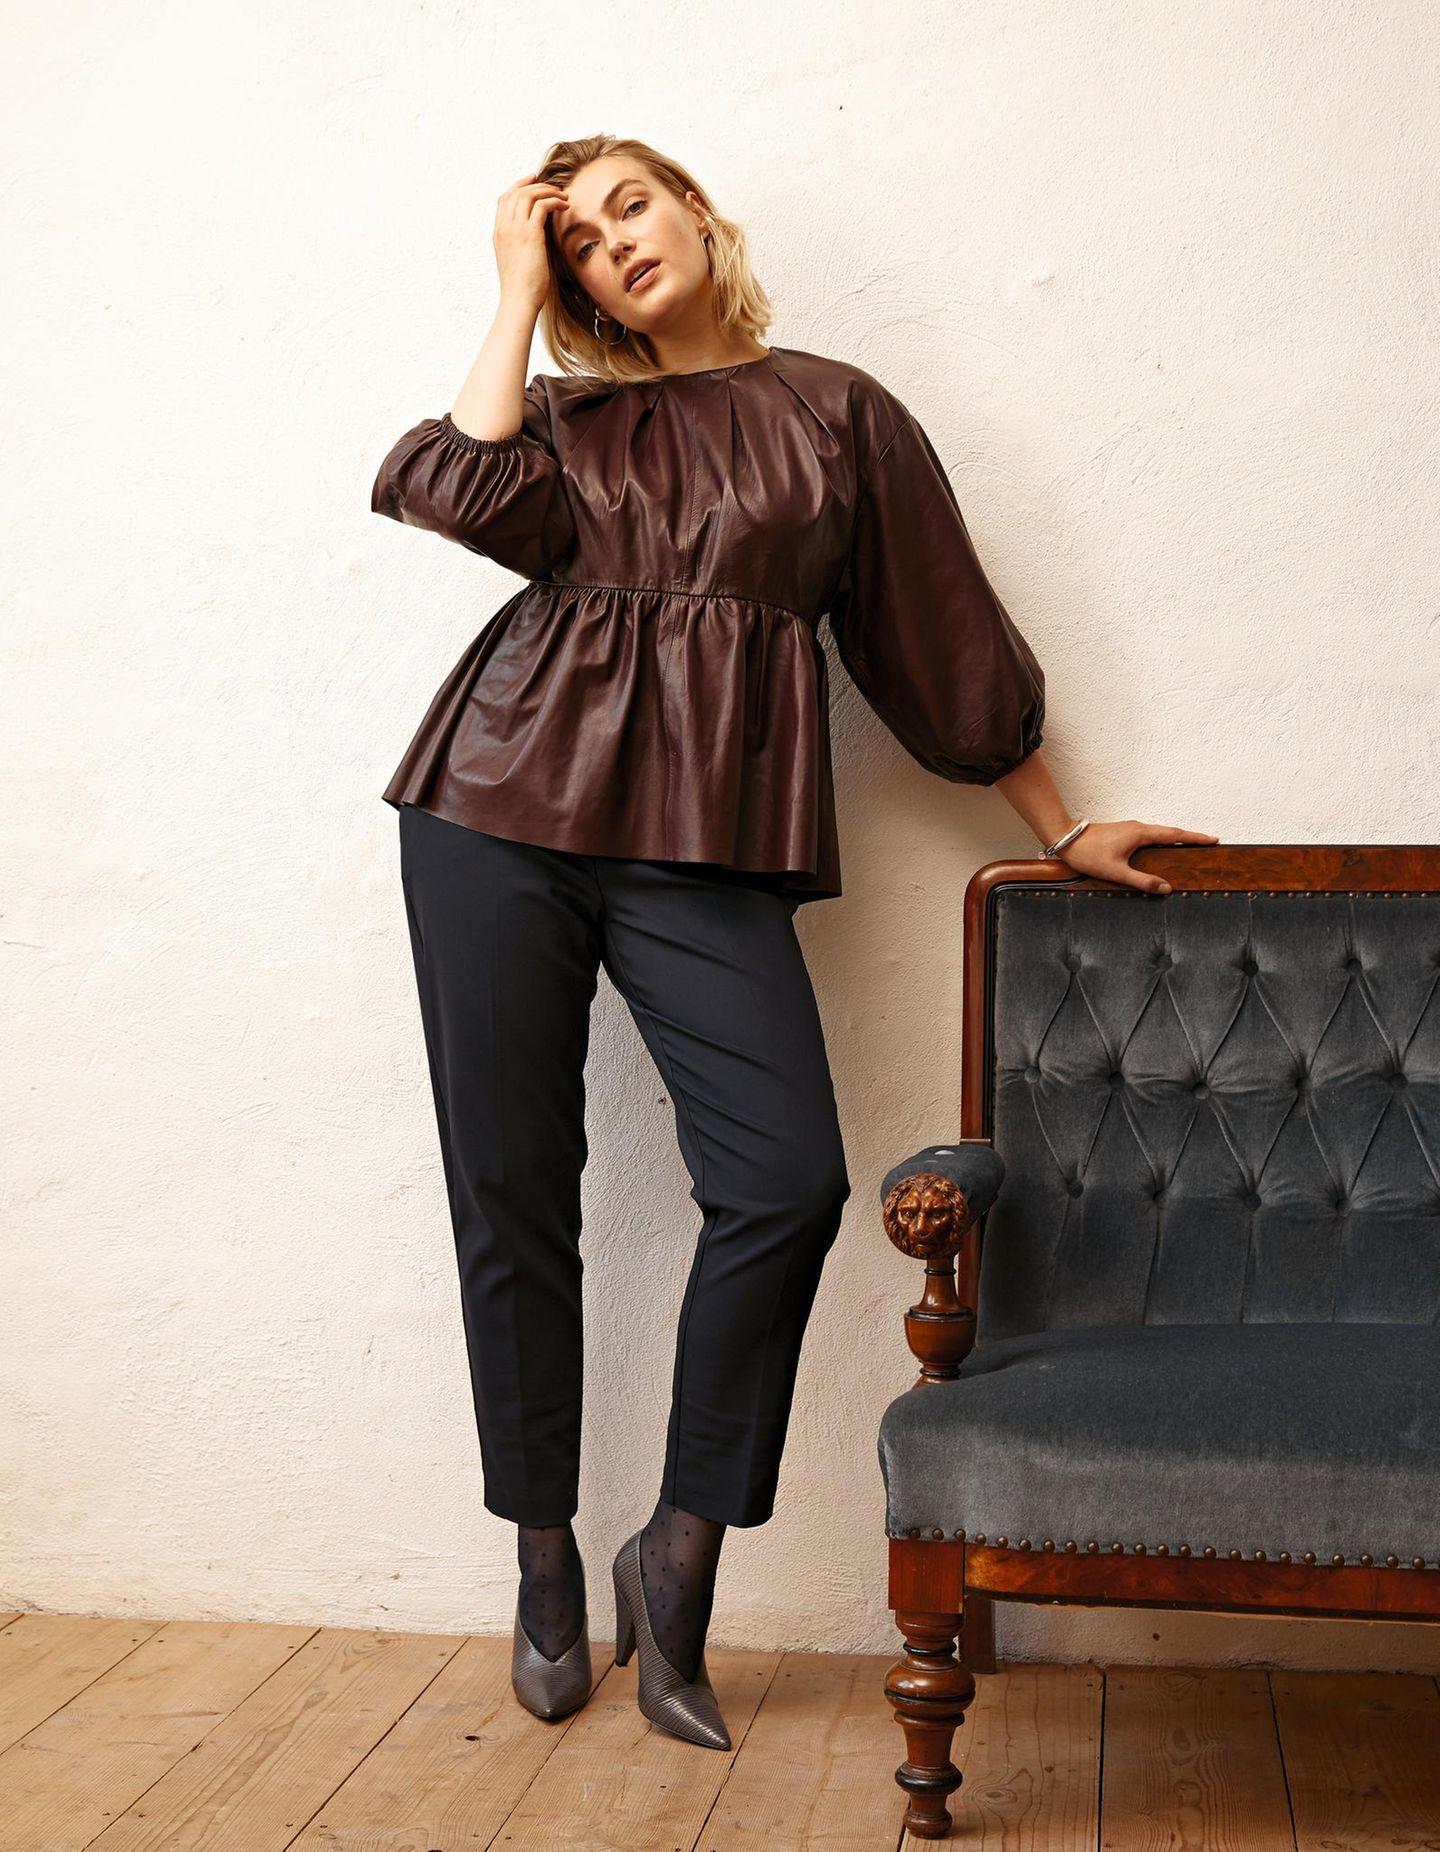 Tolle Mode: Tailliertes Ledershirt mit Hose